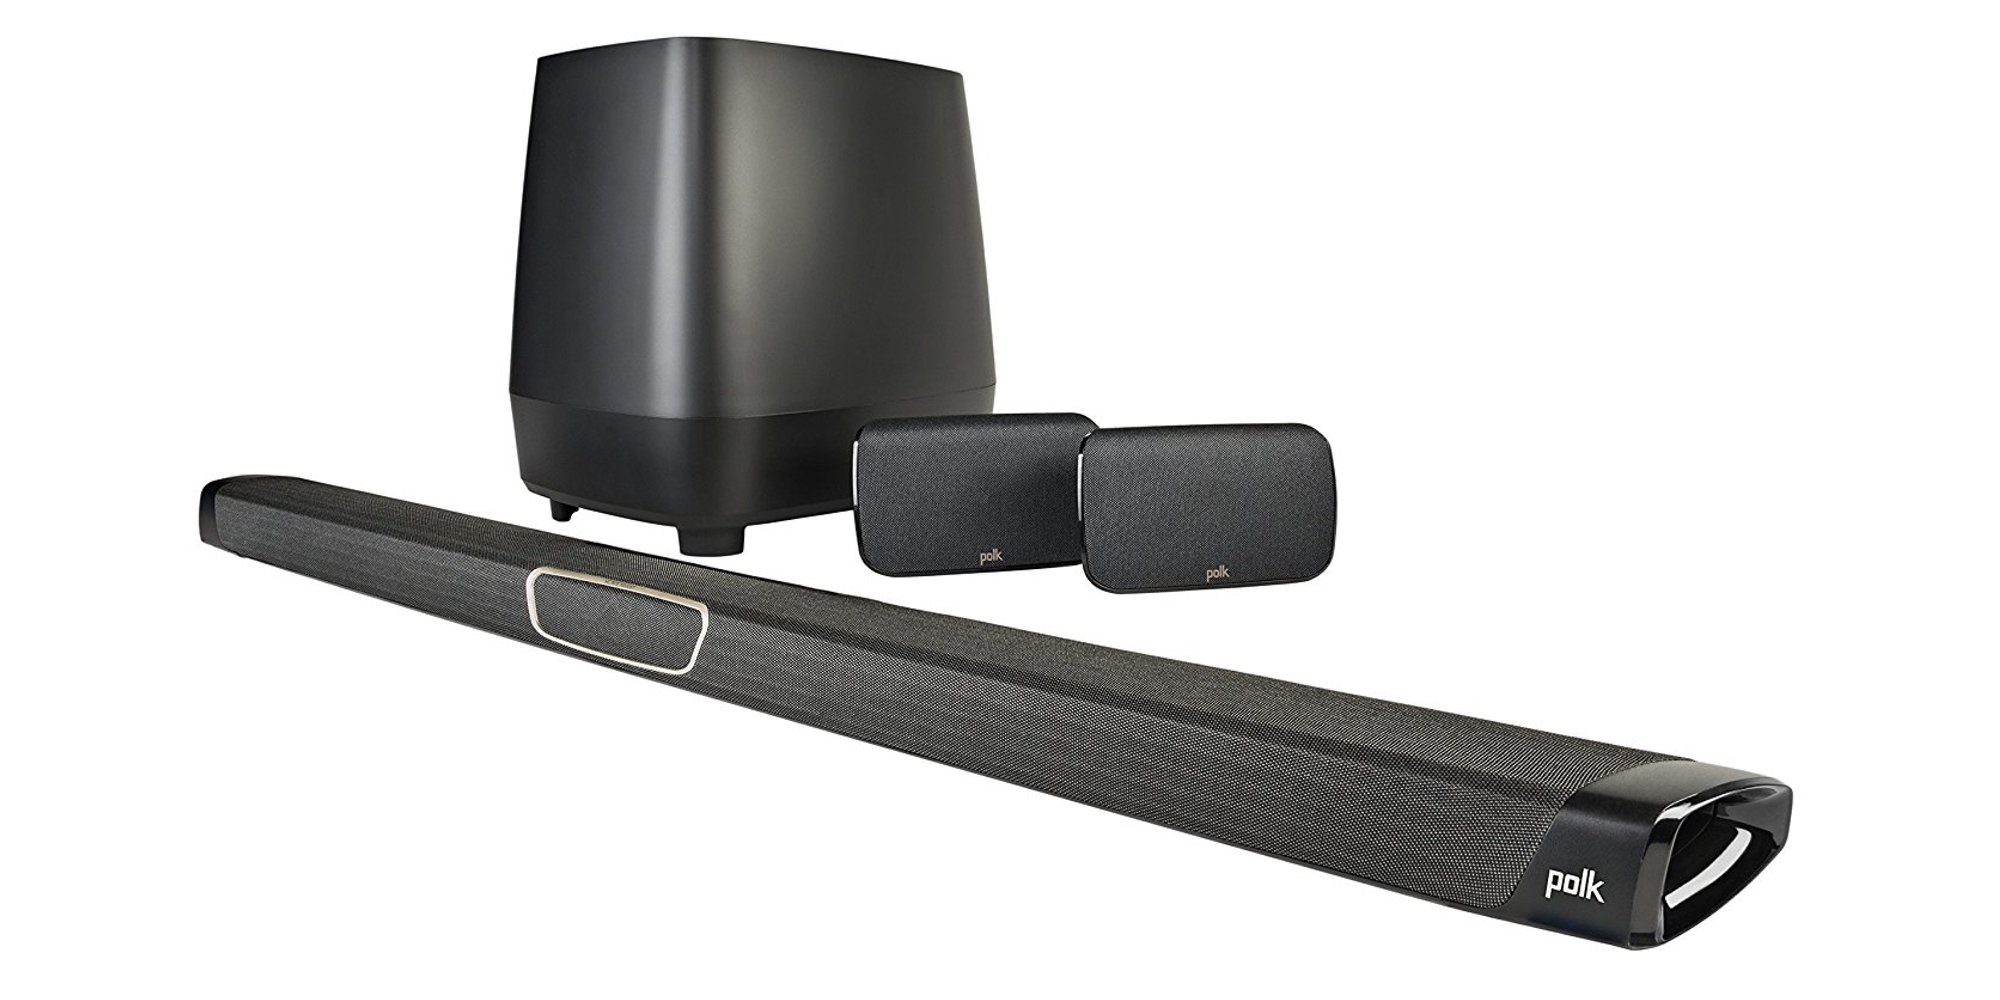 Replace your TV's speakers w/ the Polk MagniFi Max SR Chromecast Soundbar at $413 (Reg. $600)